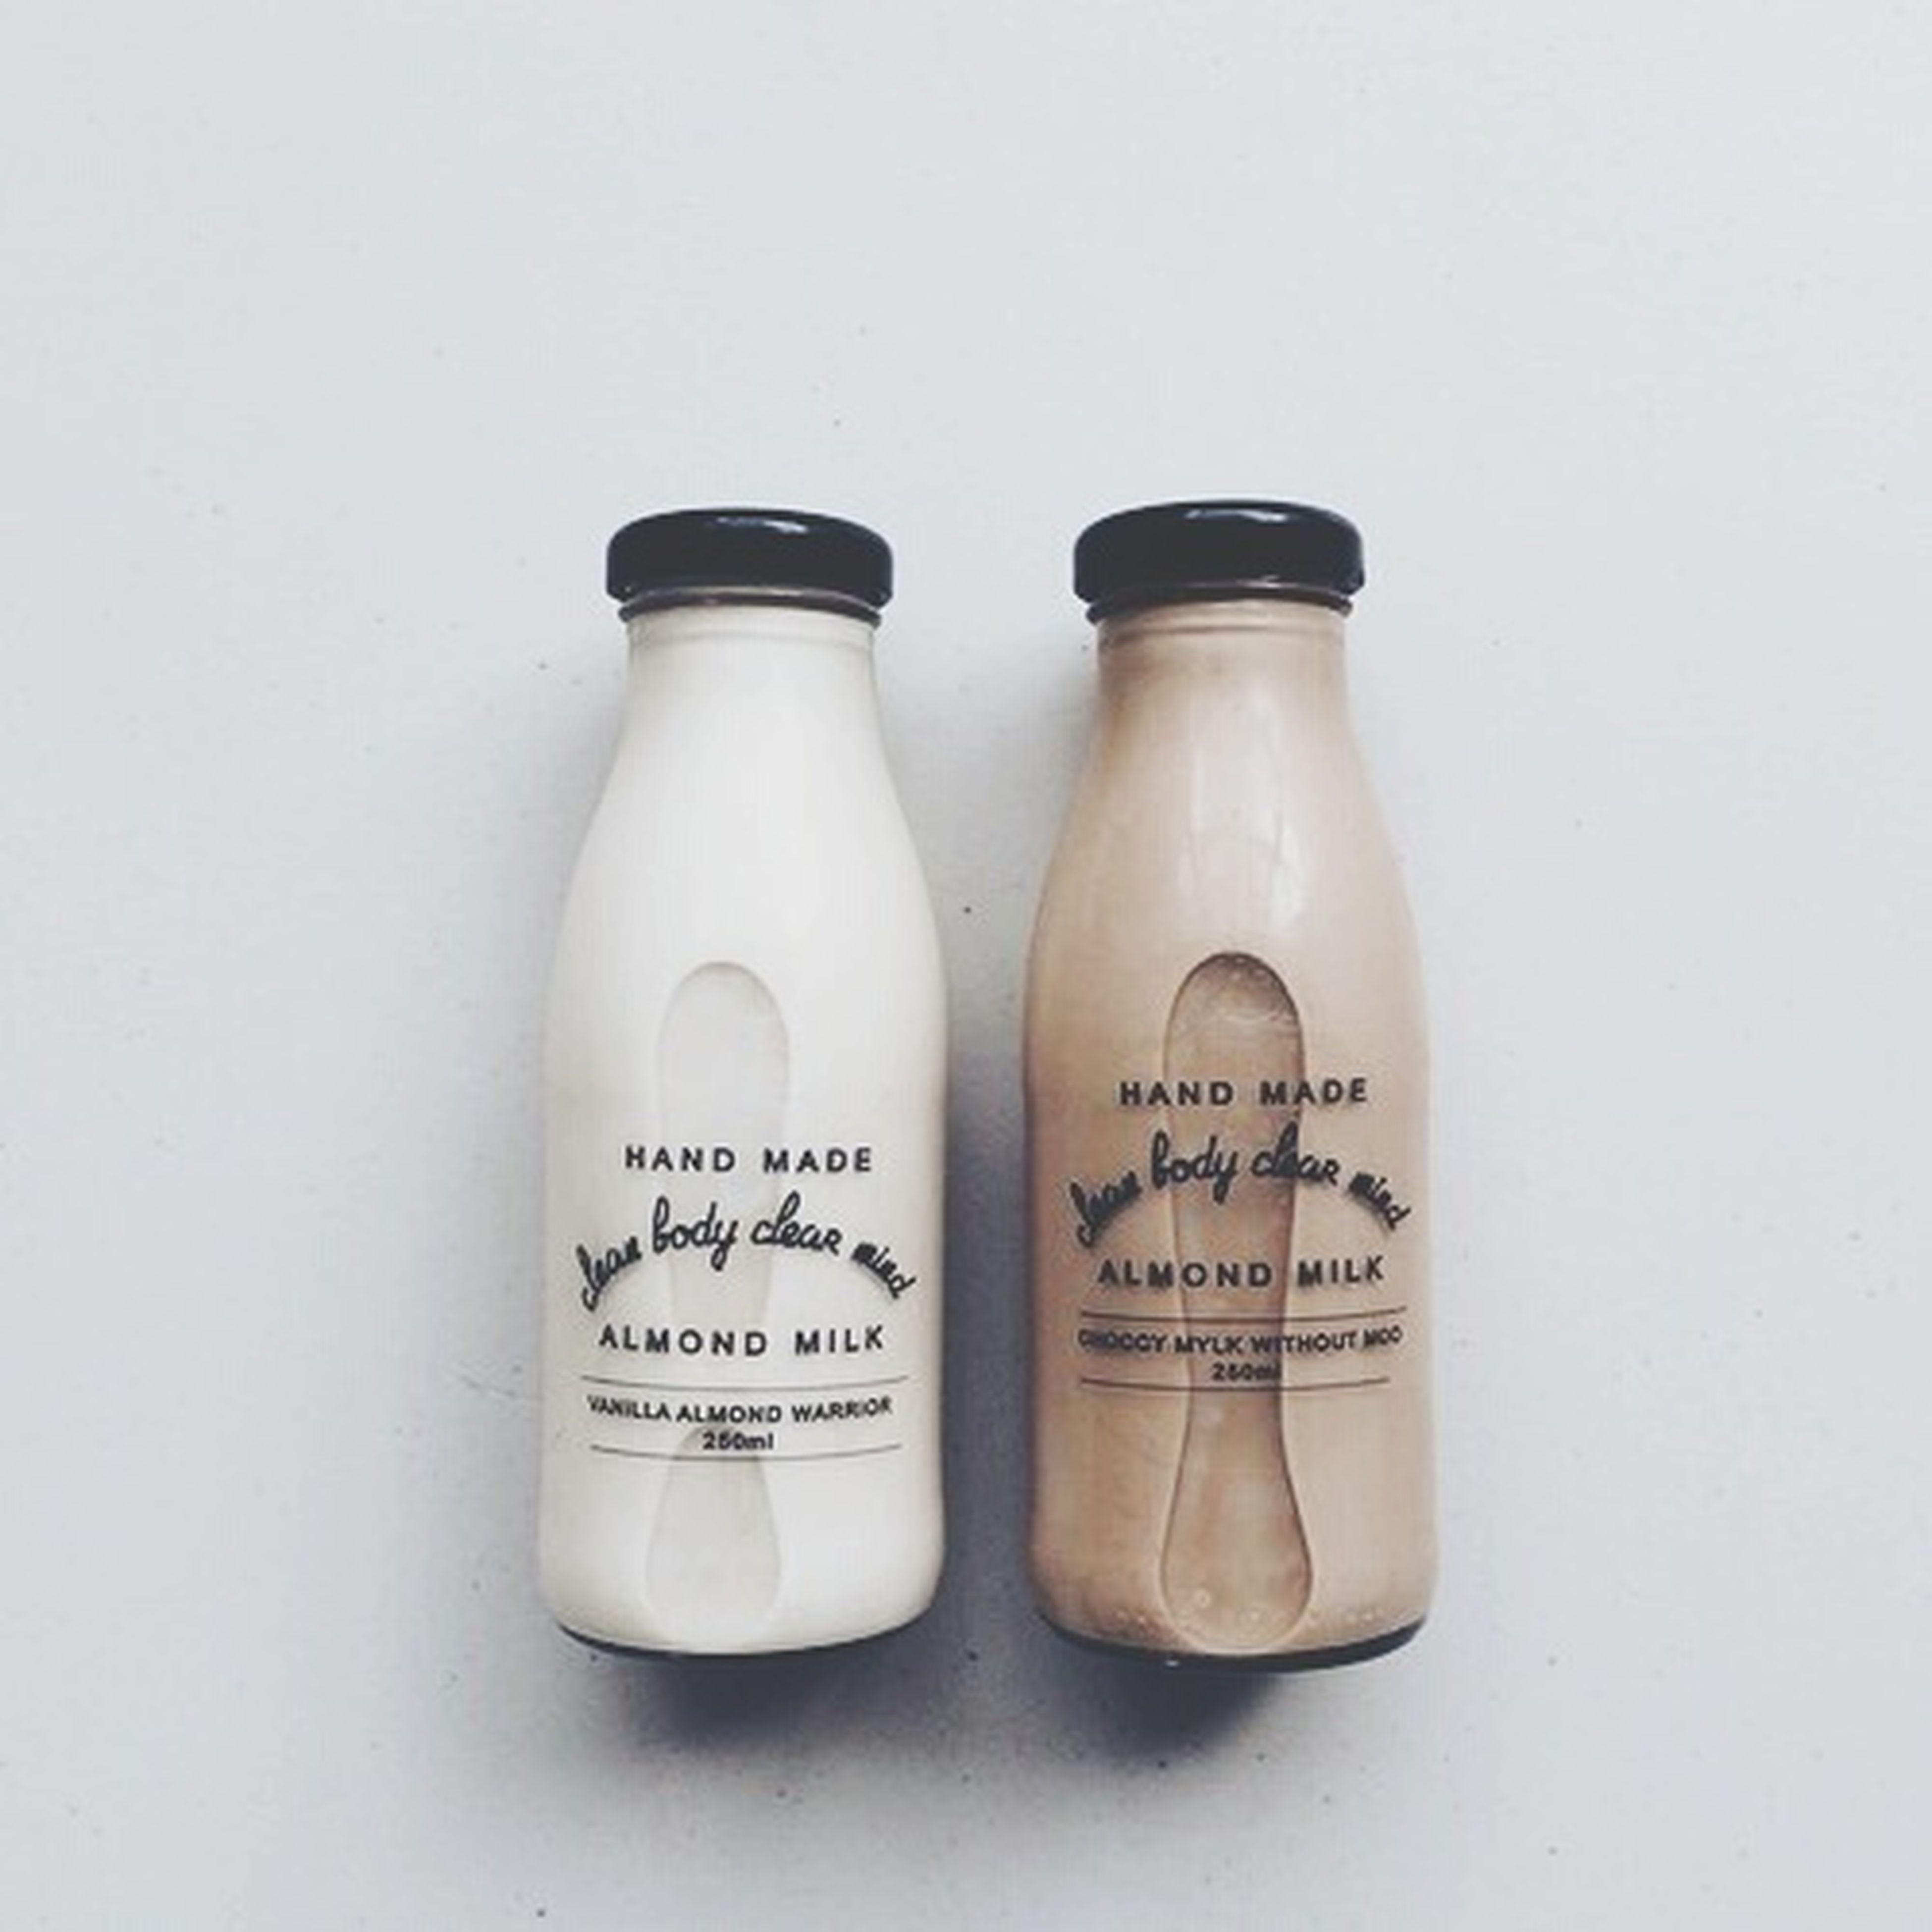 Vintage Homemade Milk The Minimals (less Edit Juxt Photography) Lovely Taste Good